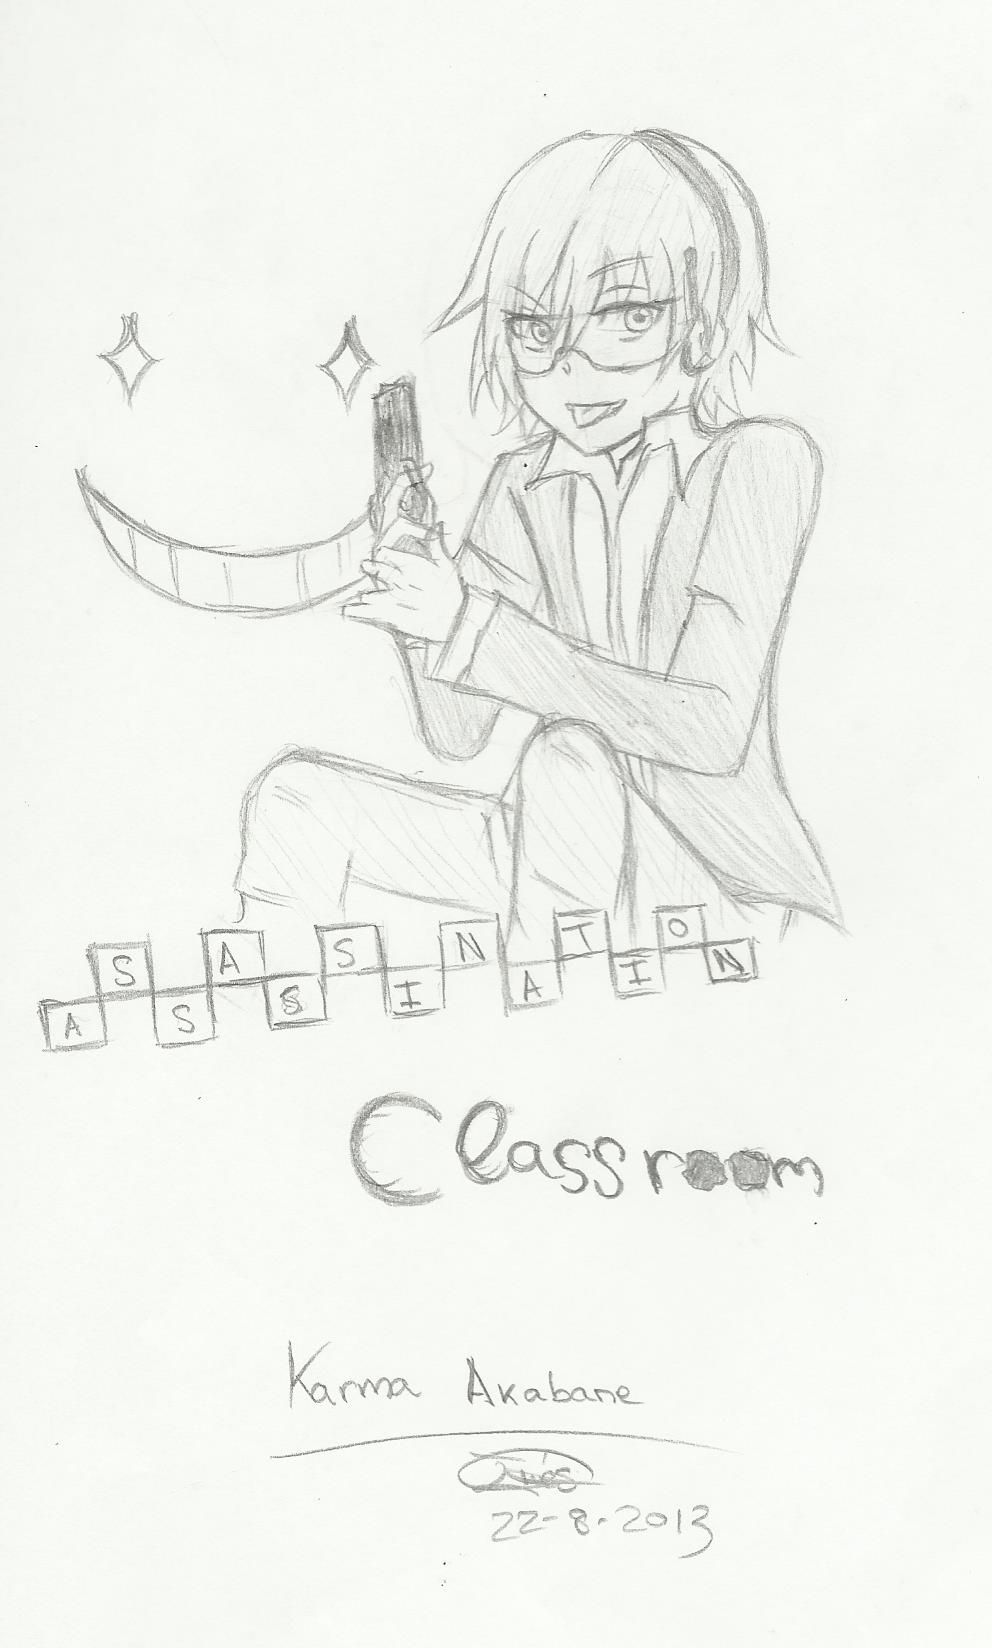 Karma Akabane - Assassination Classroom by AngieInes.deviantart.com on @DeviantArt